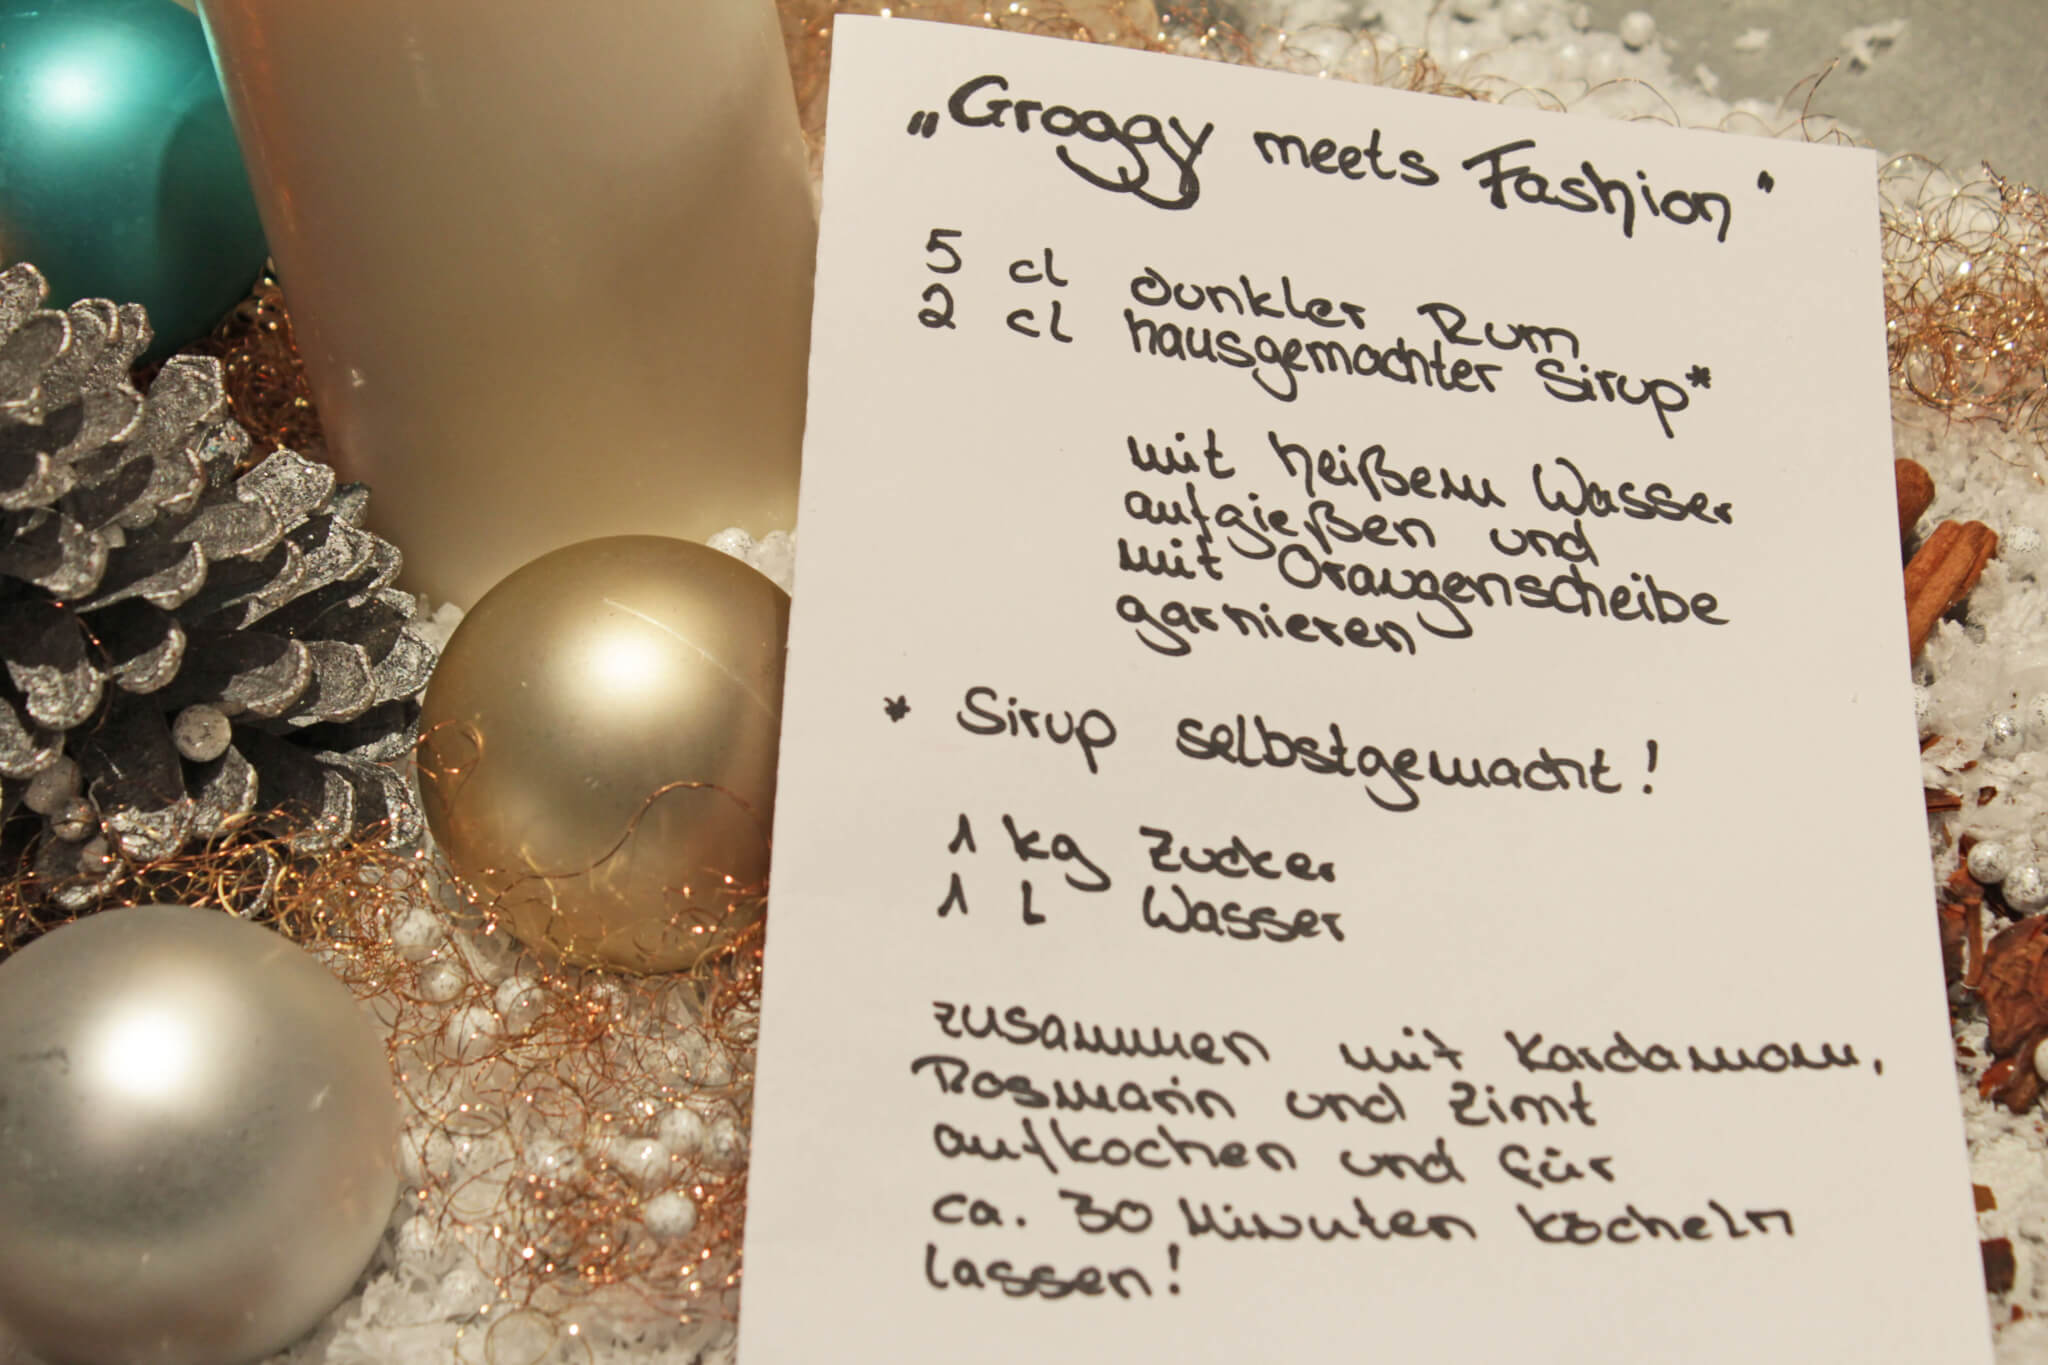 Groogy meets fashion Rezept Weihnachtsdeko